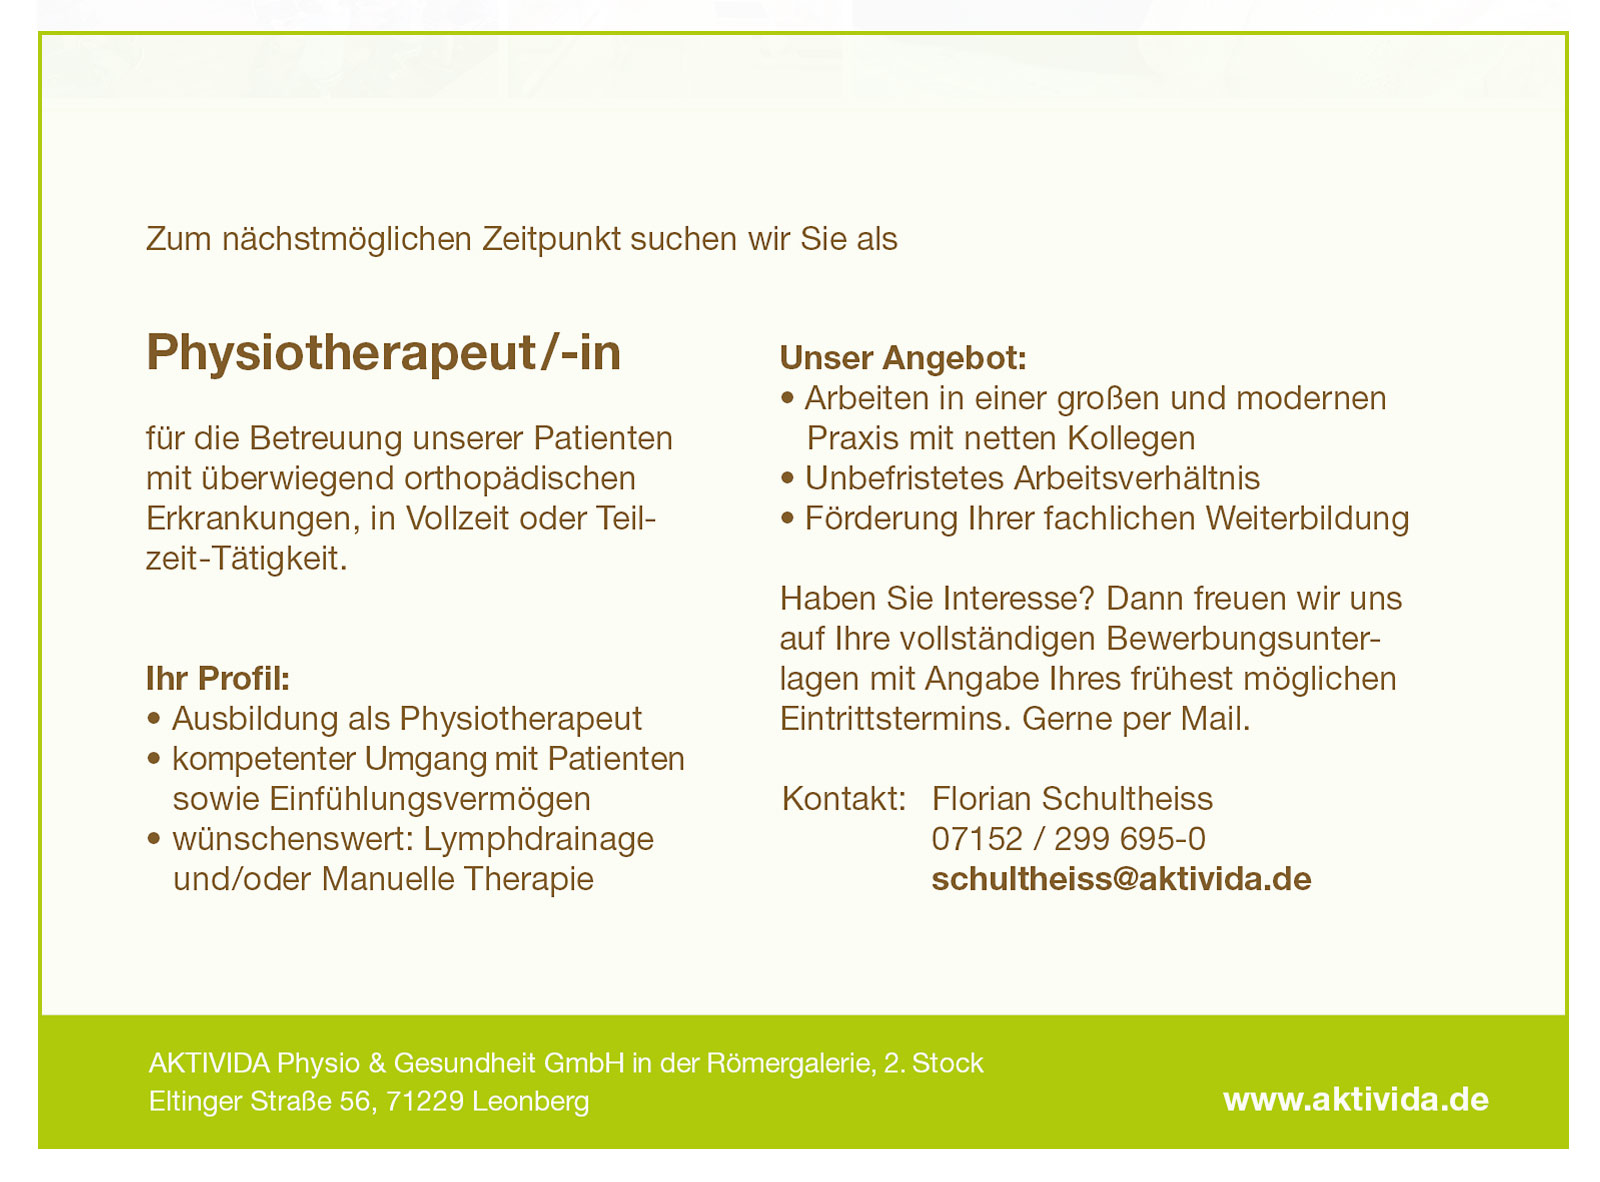 AKTIVIDA Leonberg Stellenangebot Physiotherapeut-in 02-2020